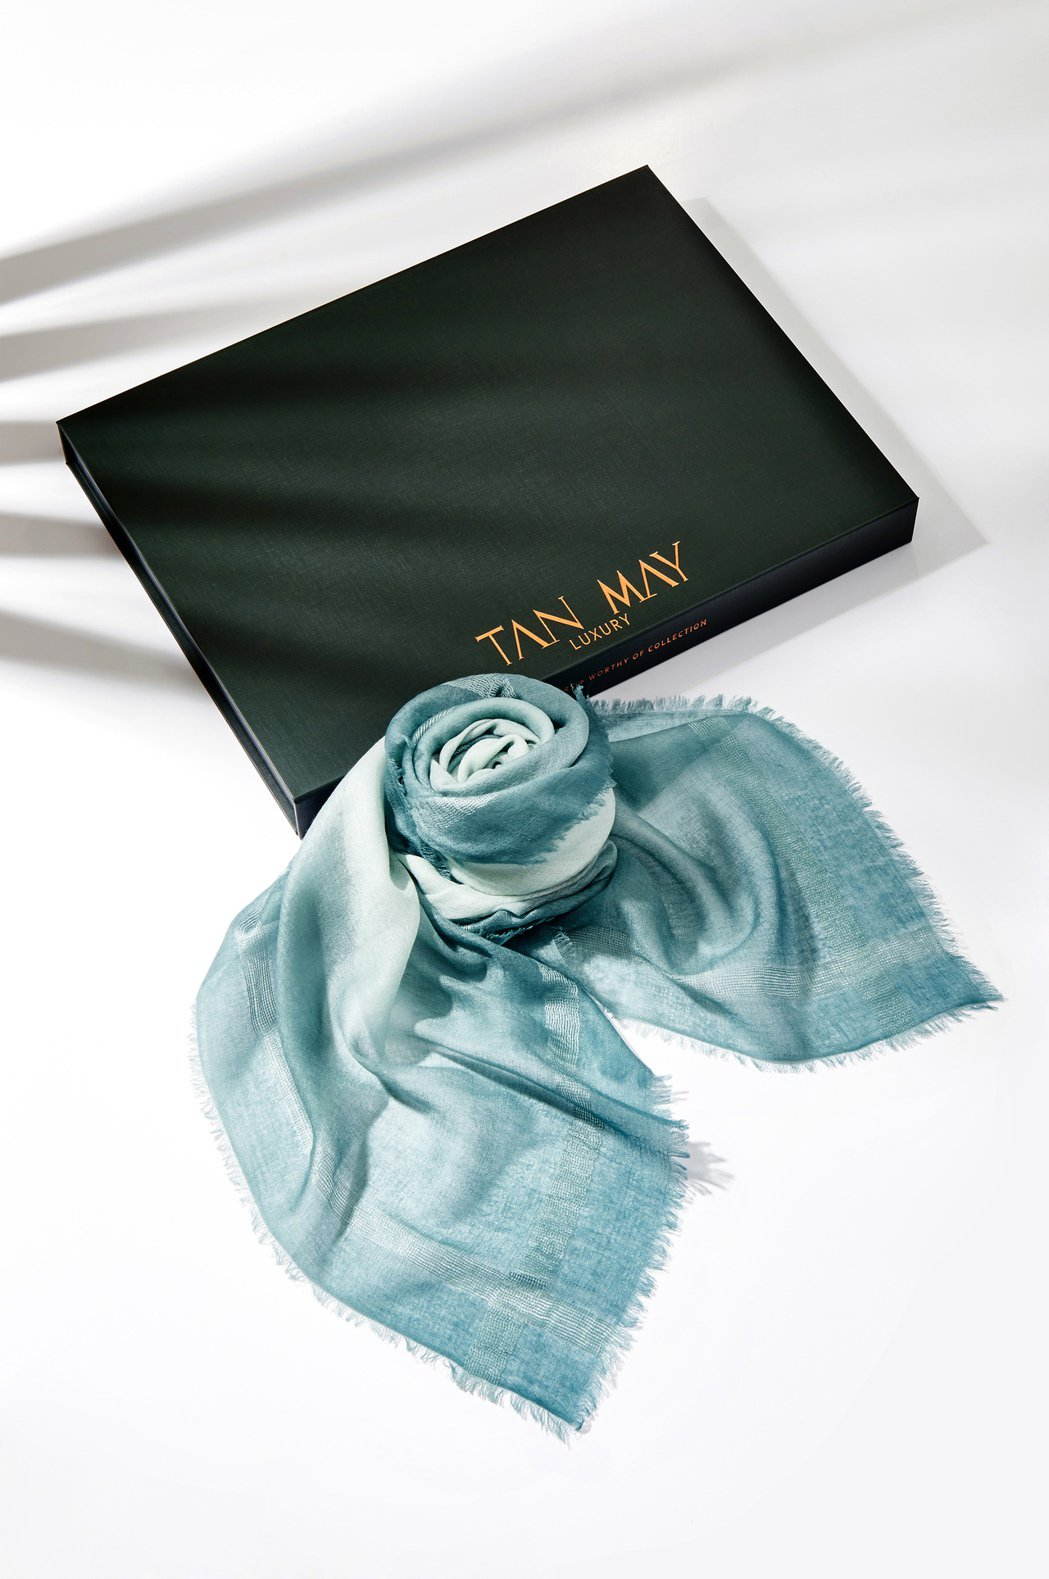 TAN MAY經典邊蠶絲緞染湖水綠羊絨方巾。圖/TAN MAY提供